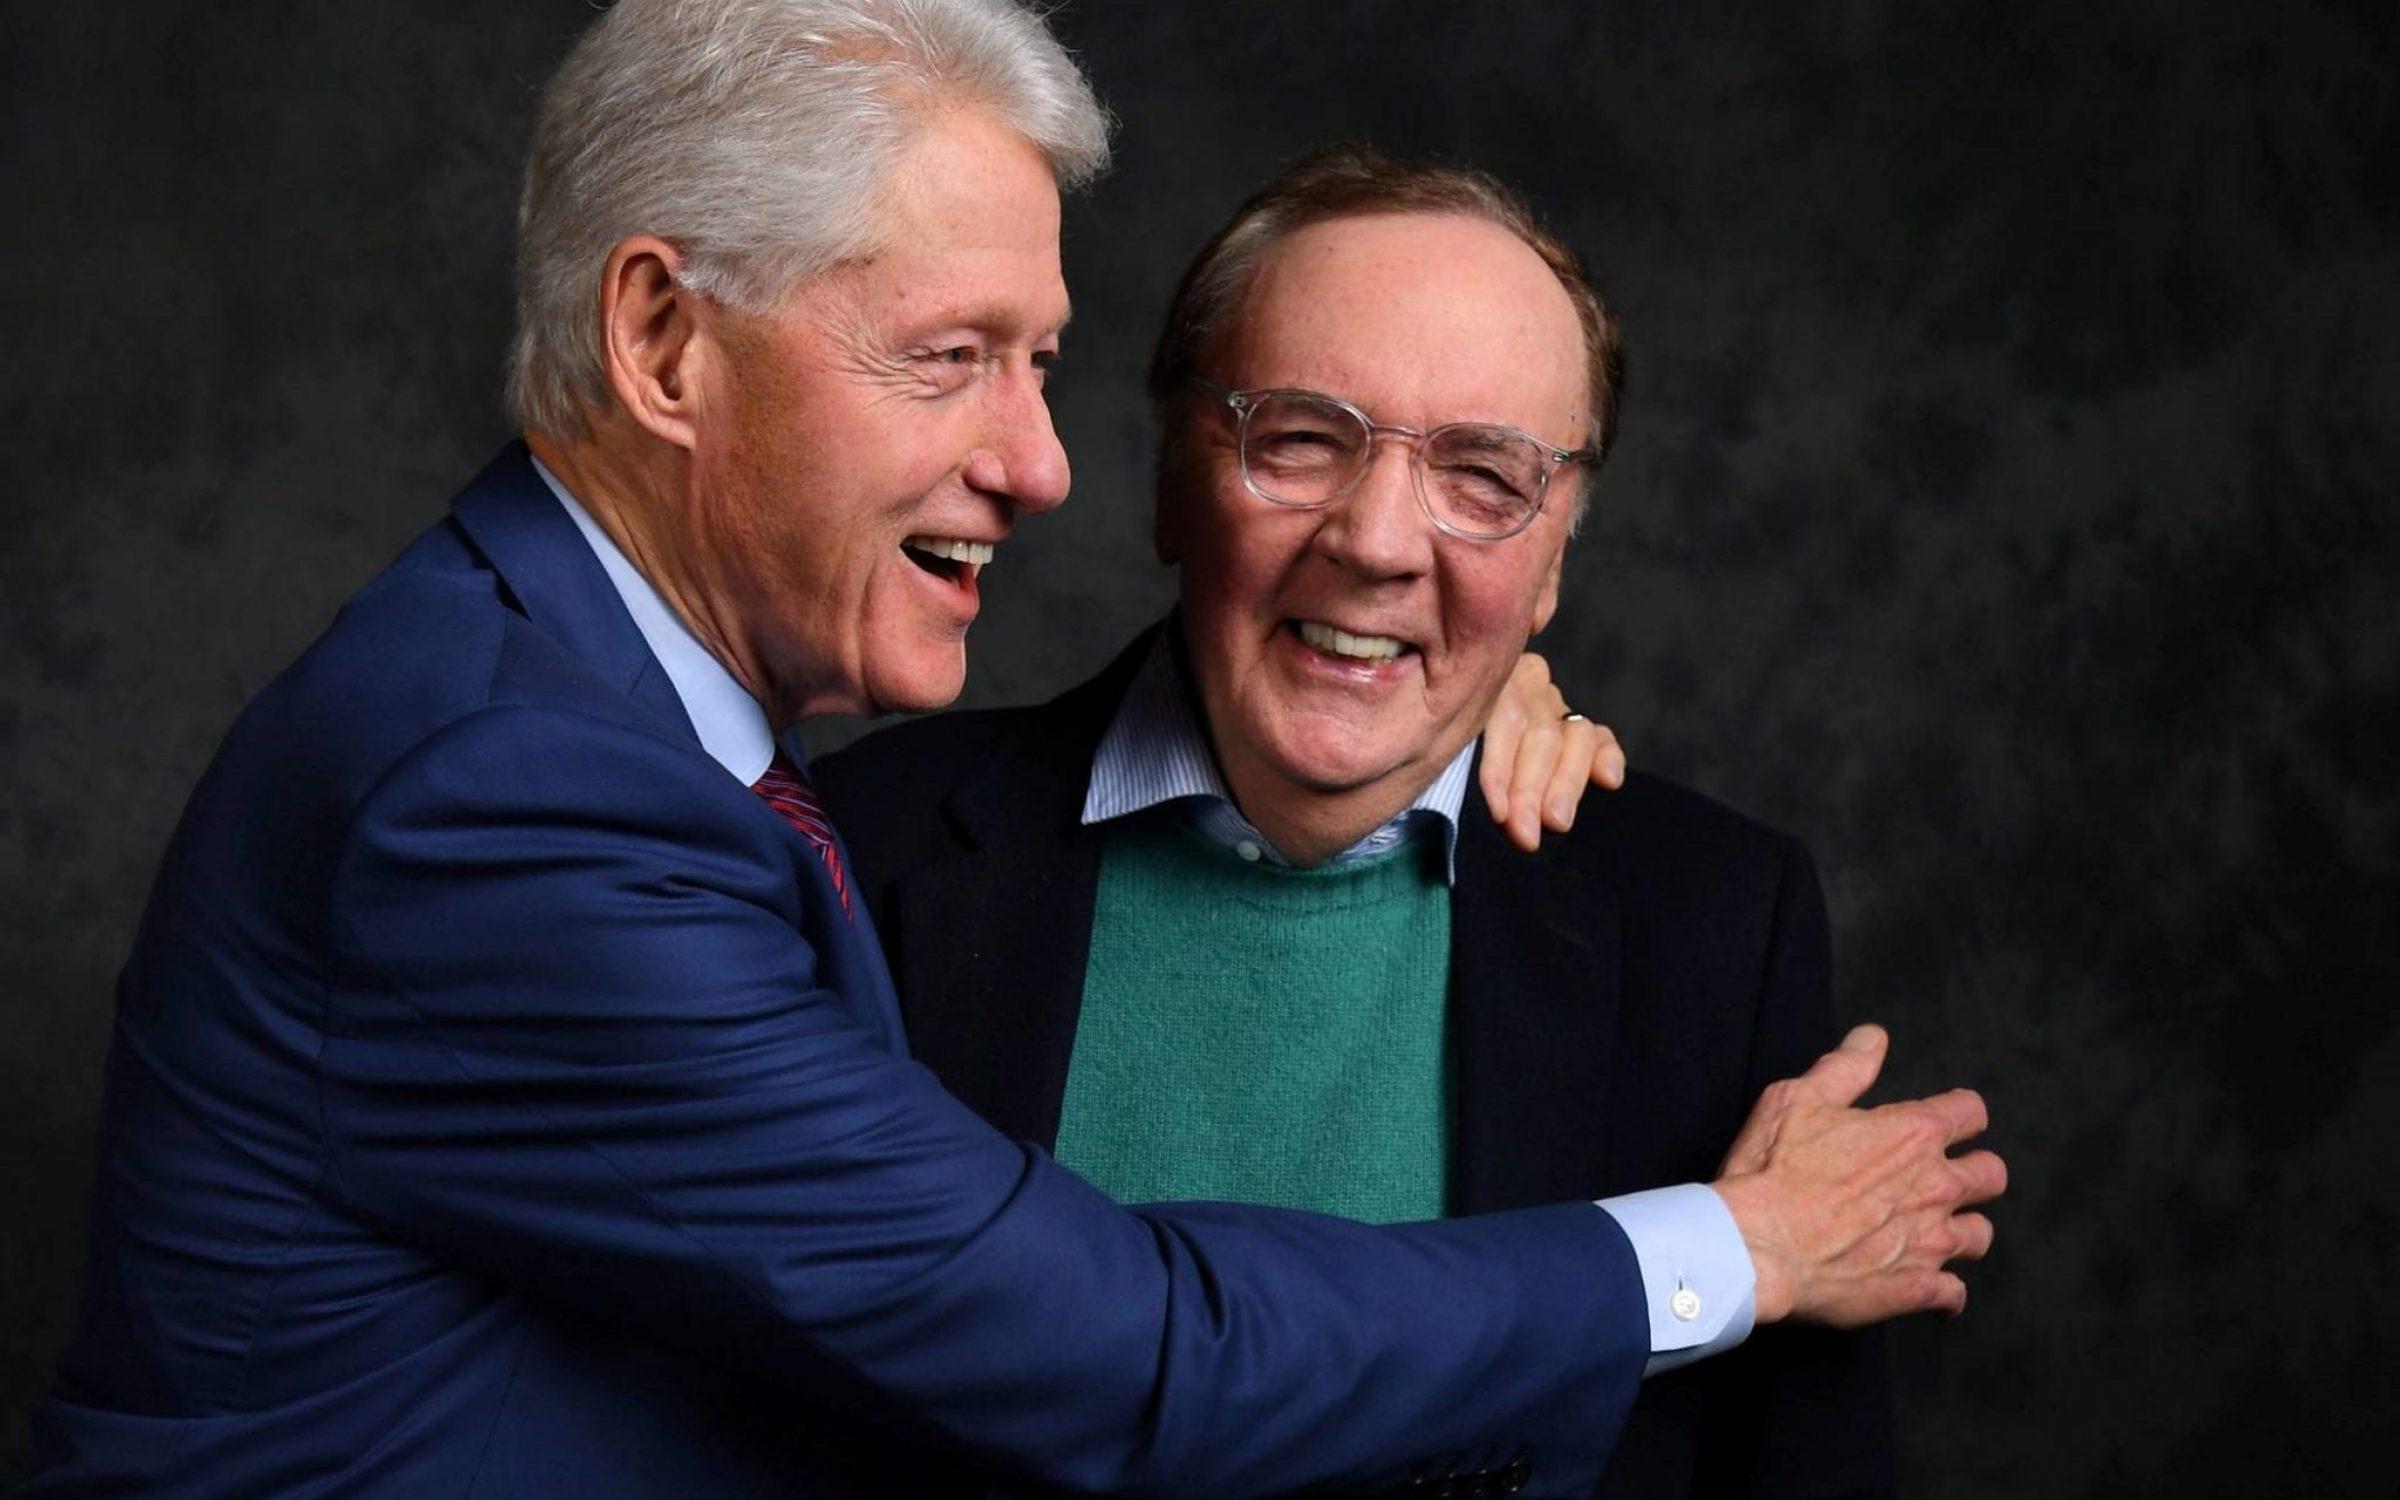 James-Patterson-and-President-Bill-Clinton-scaled-p8grmgvp76lhnf6wsckai81w3pclww61j3ut2bksyg